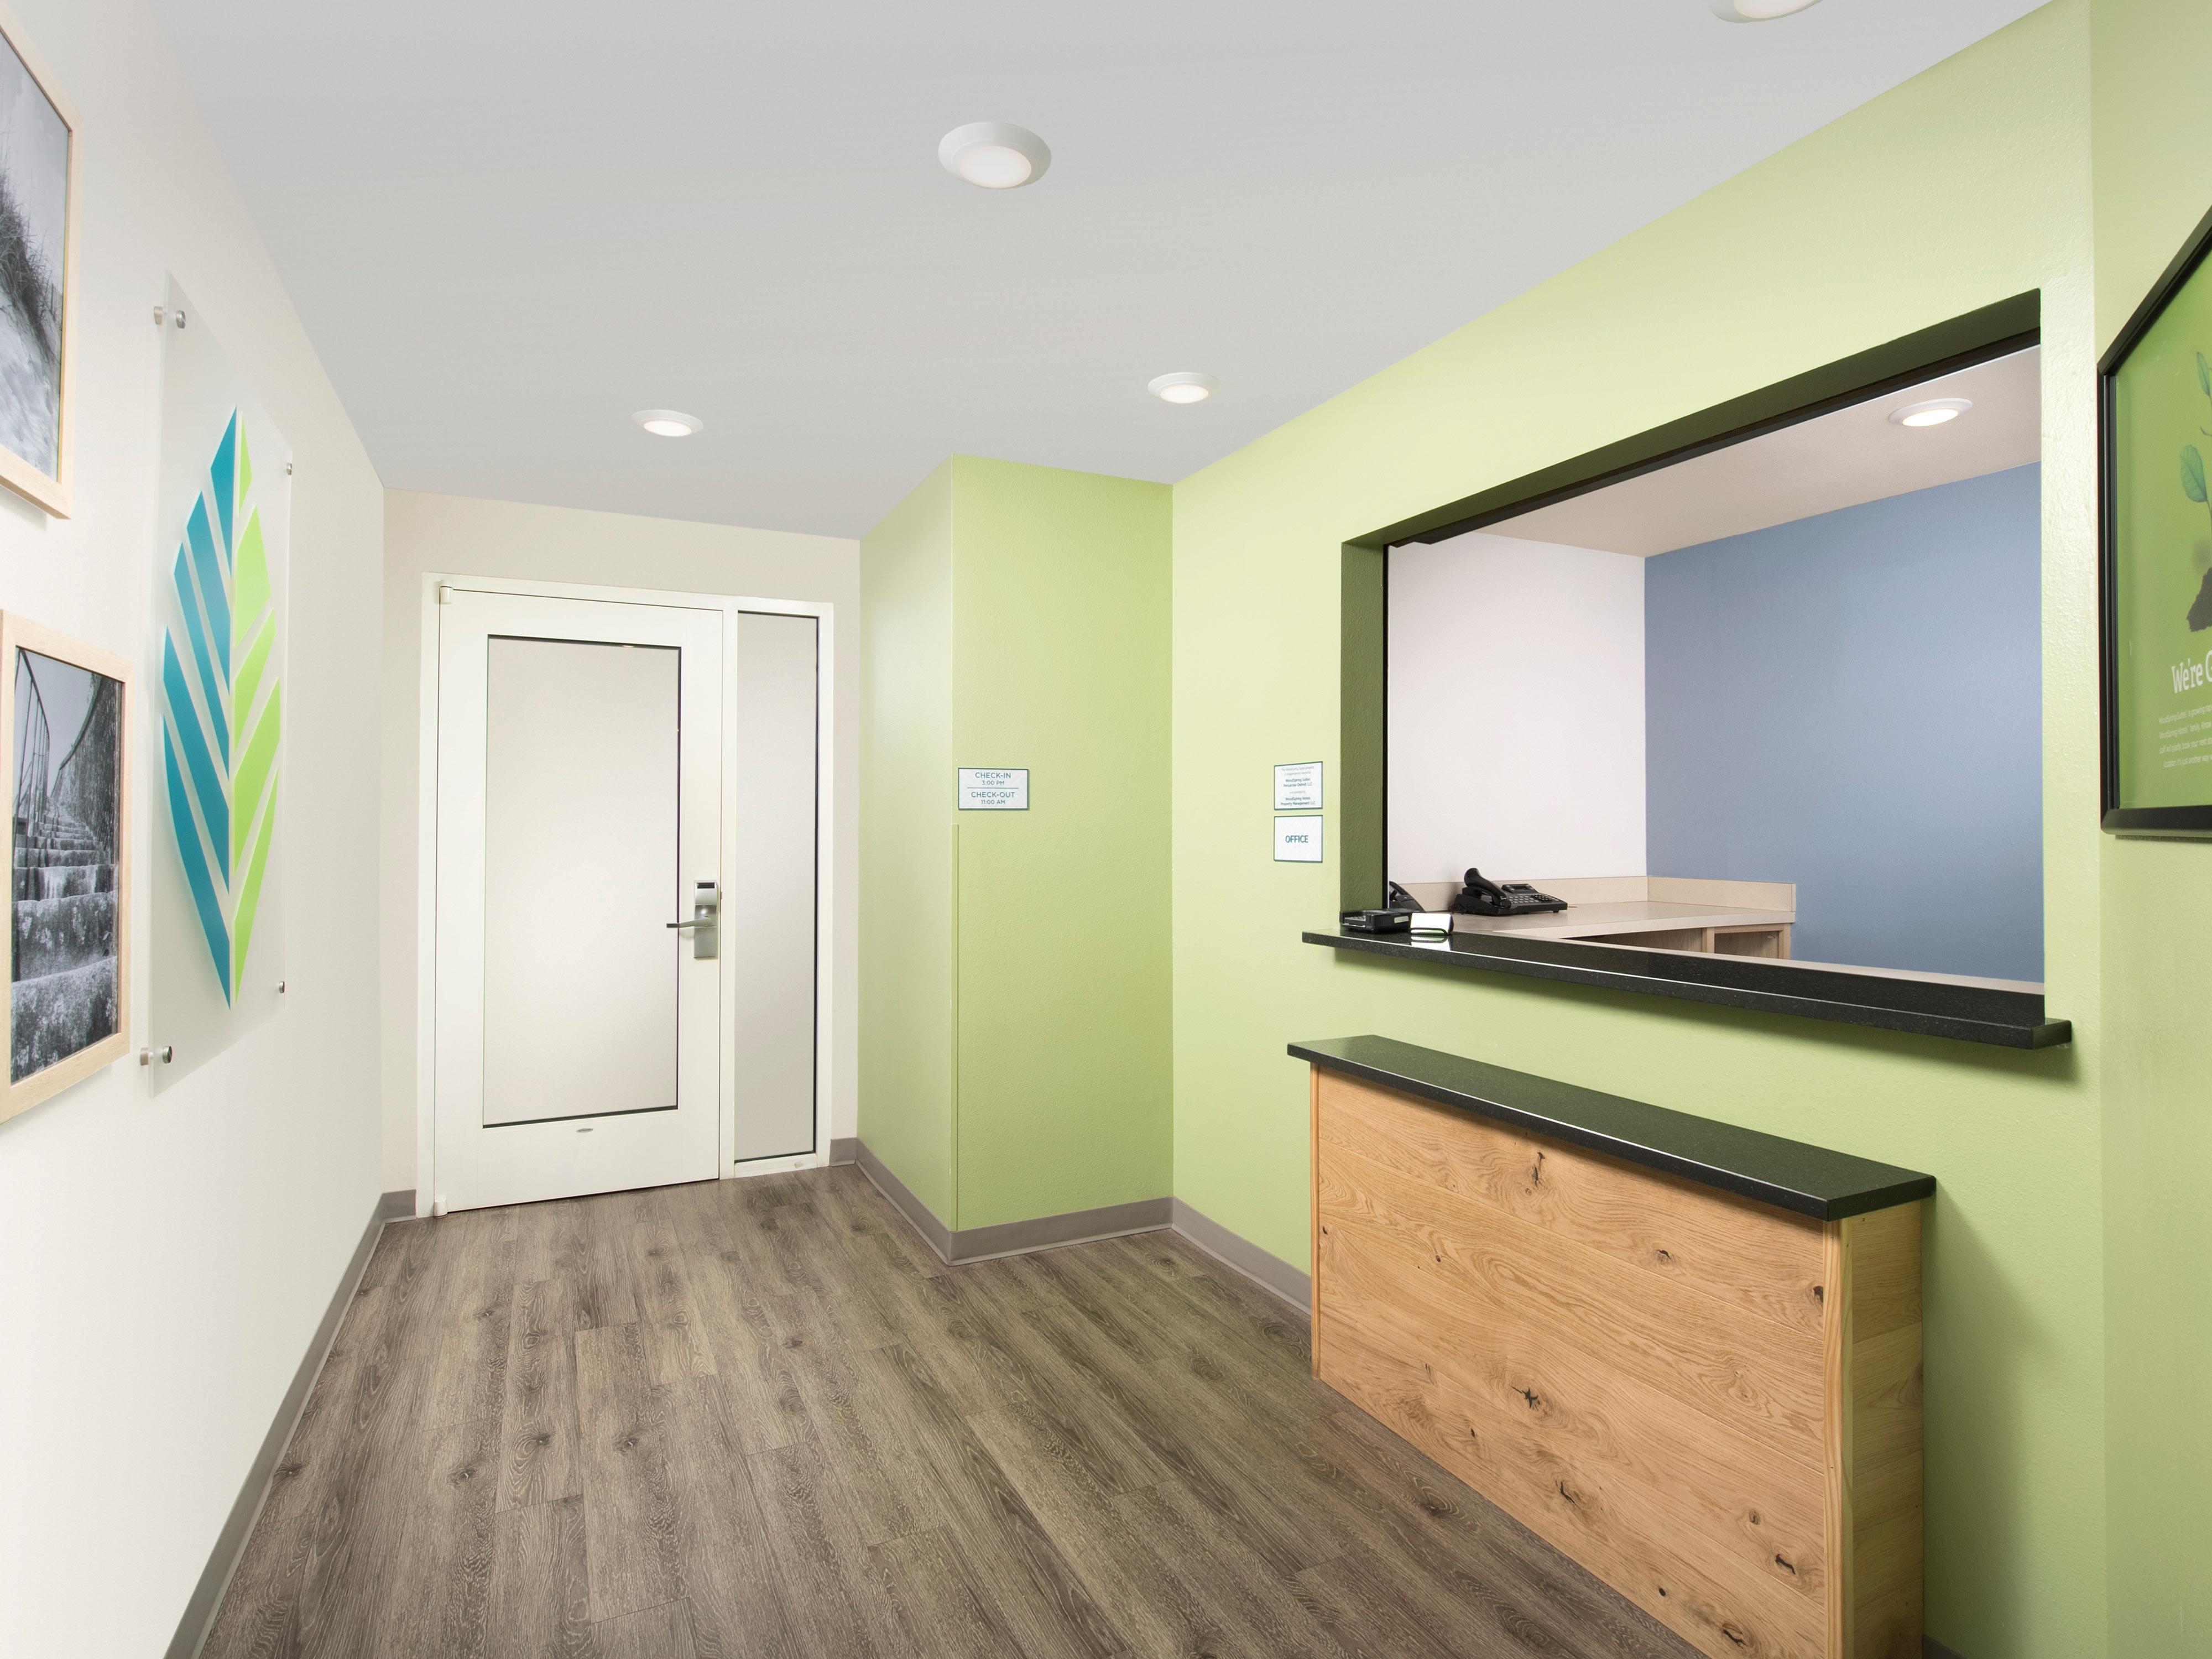 WoodSpring Suites Pensacola Northeast image 25